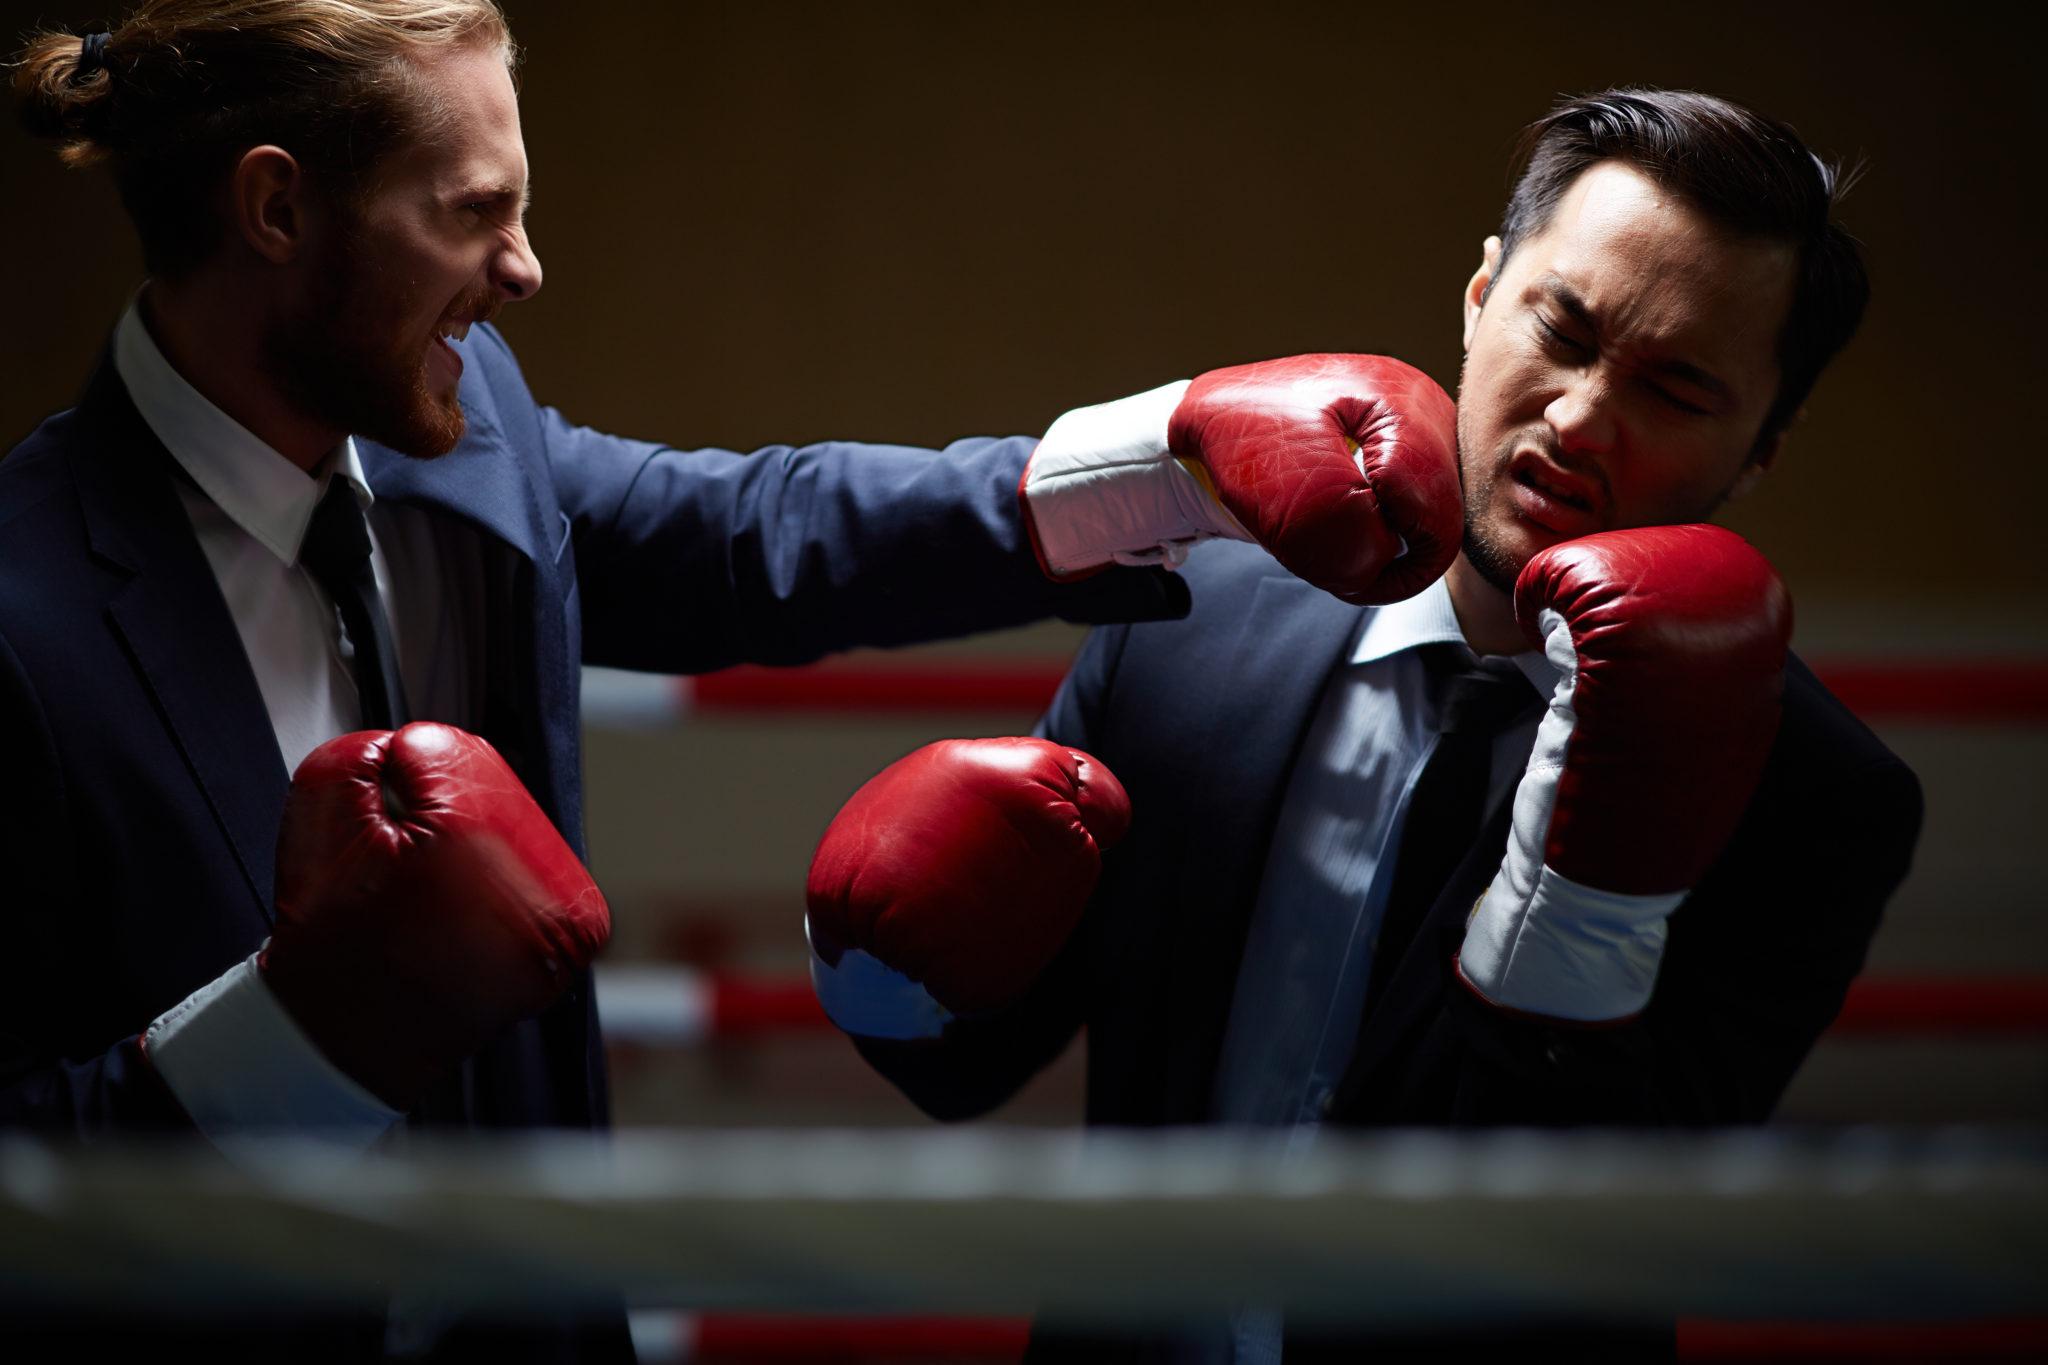 Борьба с вашими конкурентами